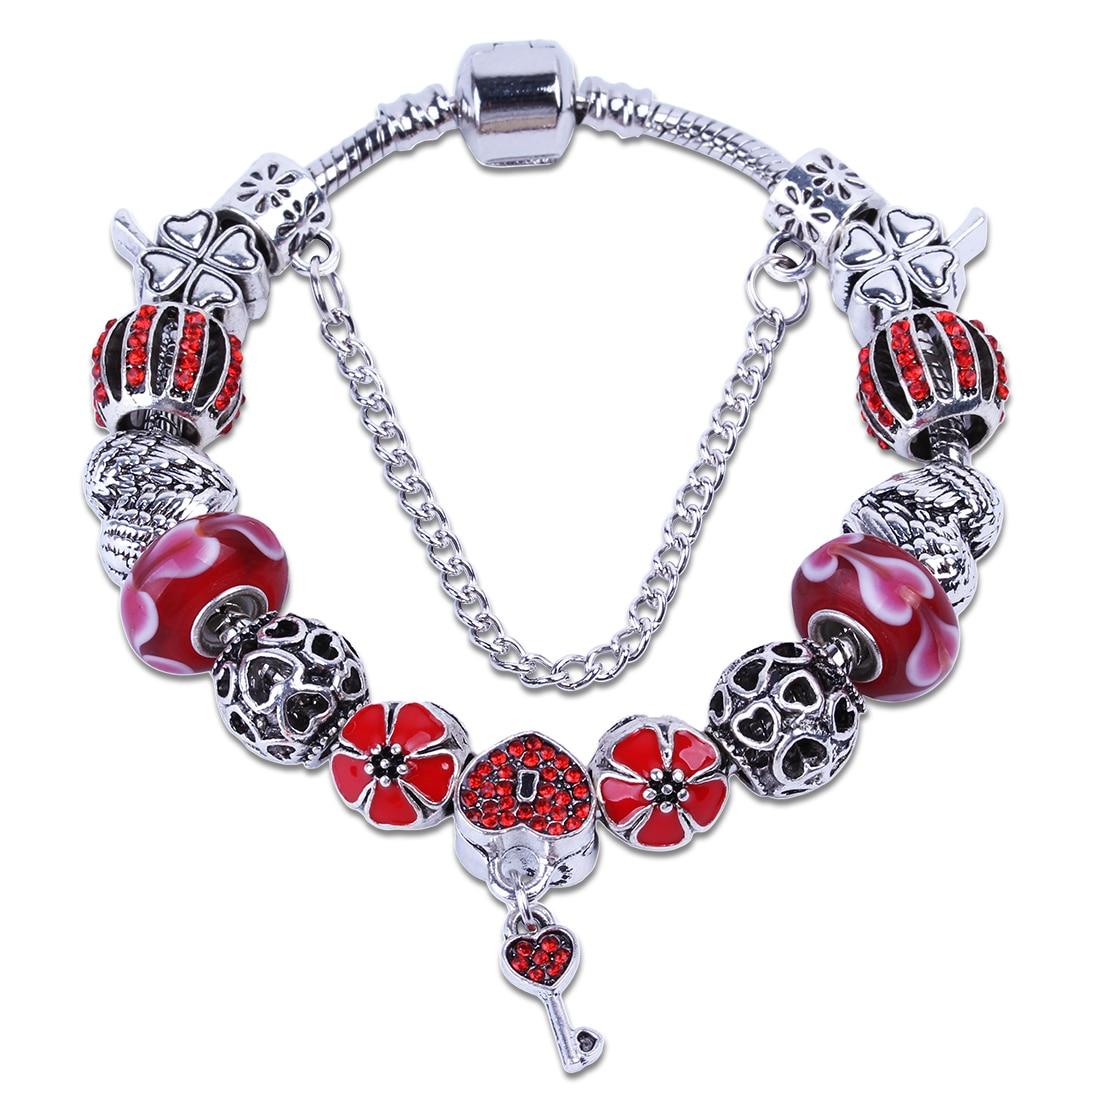 Wholesale Red Crystal Rhinestone Flowers Charms Bracelet Heart Key Diy  Beads Fit European Charm Bracelets &